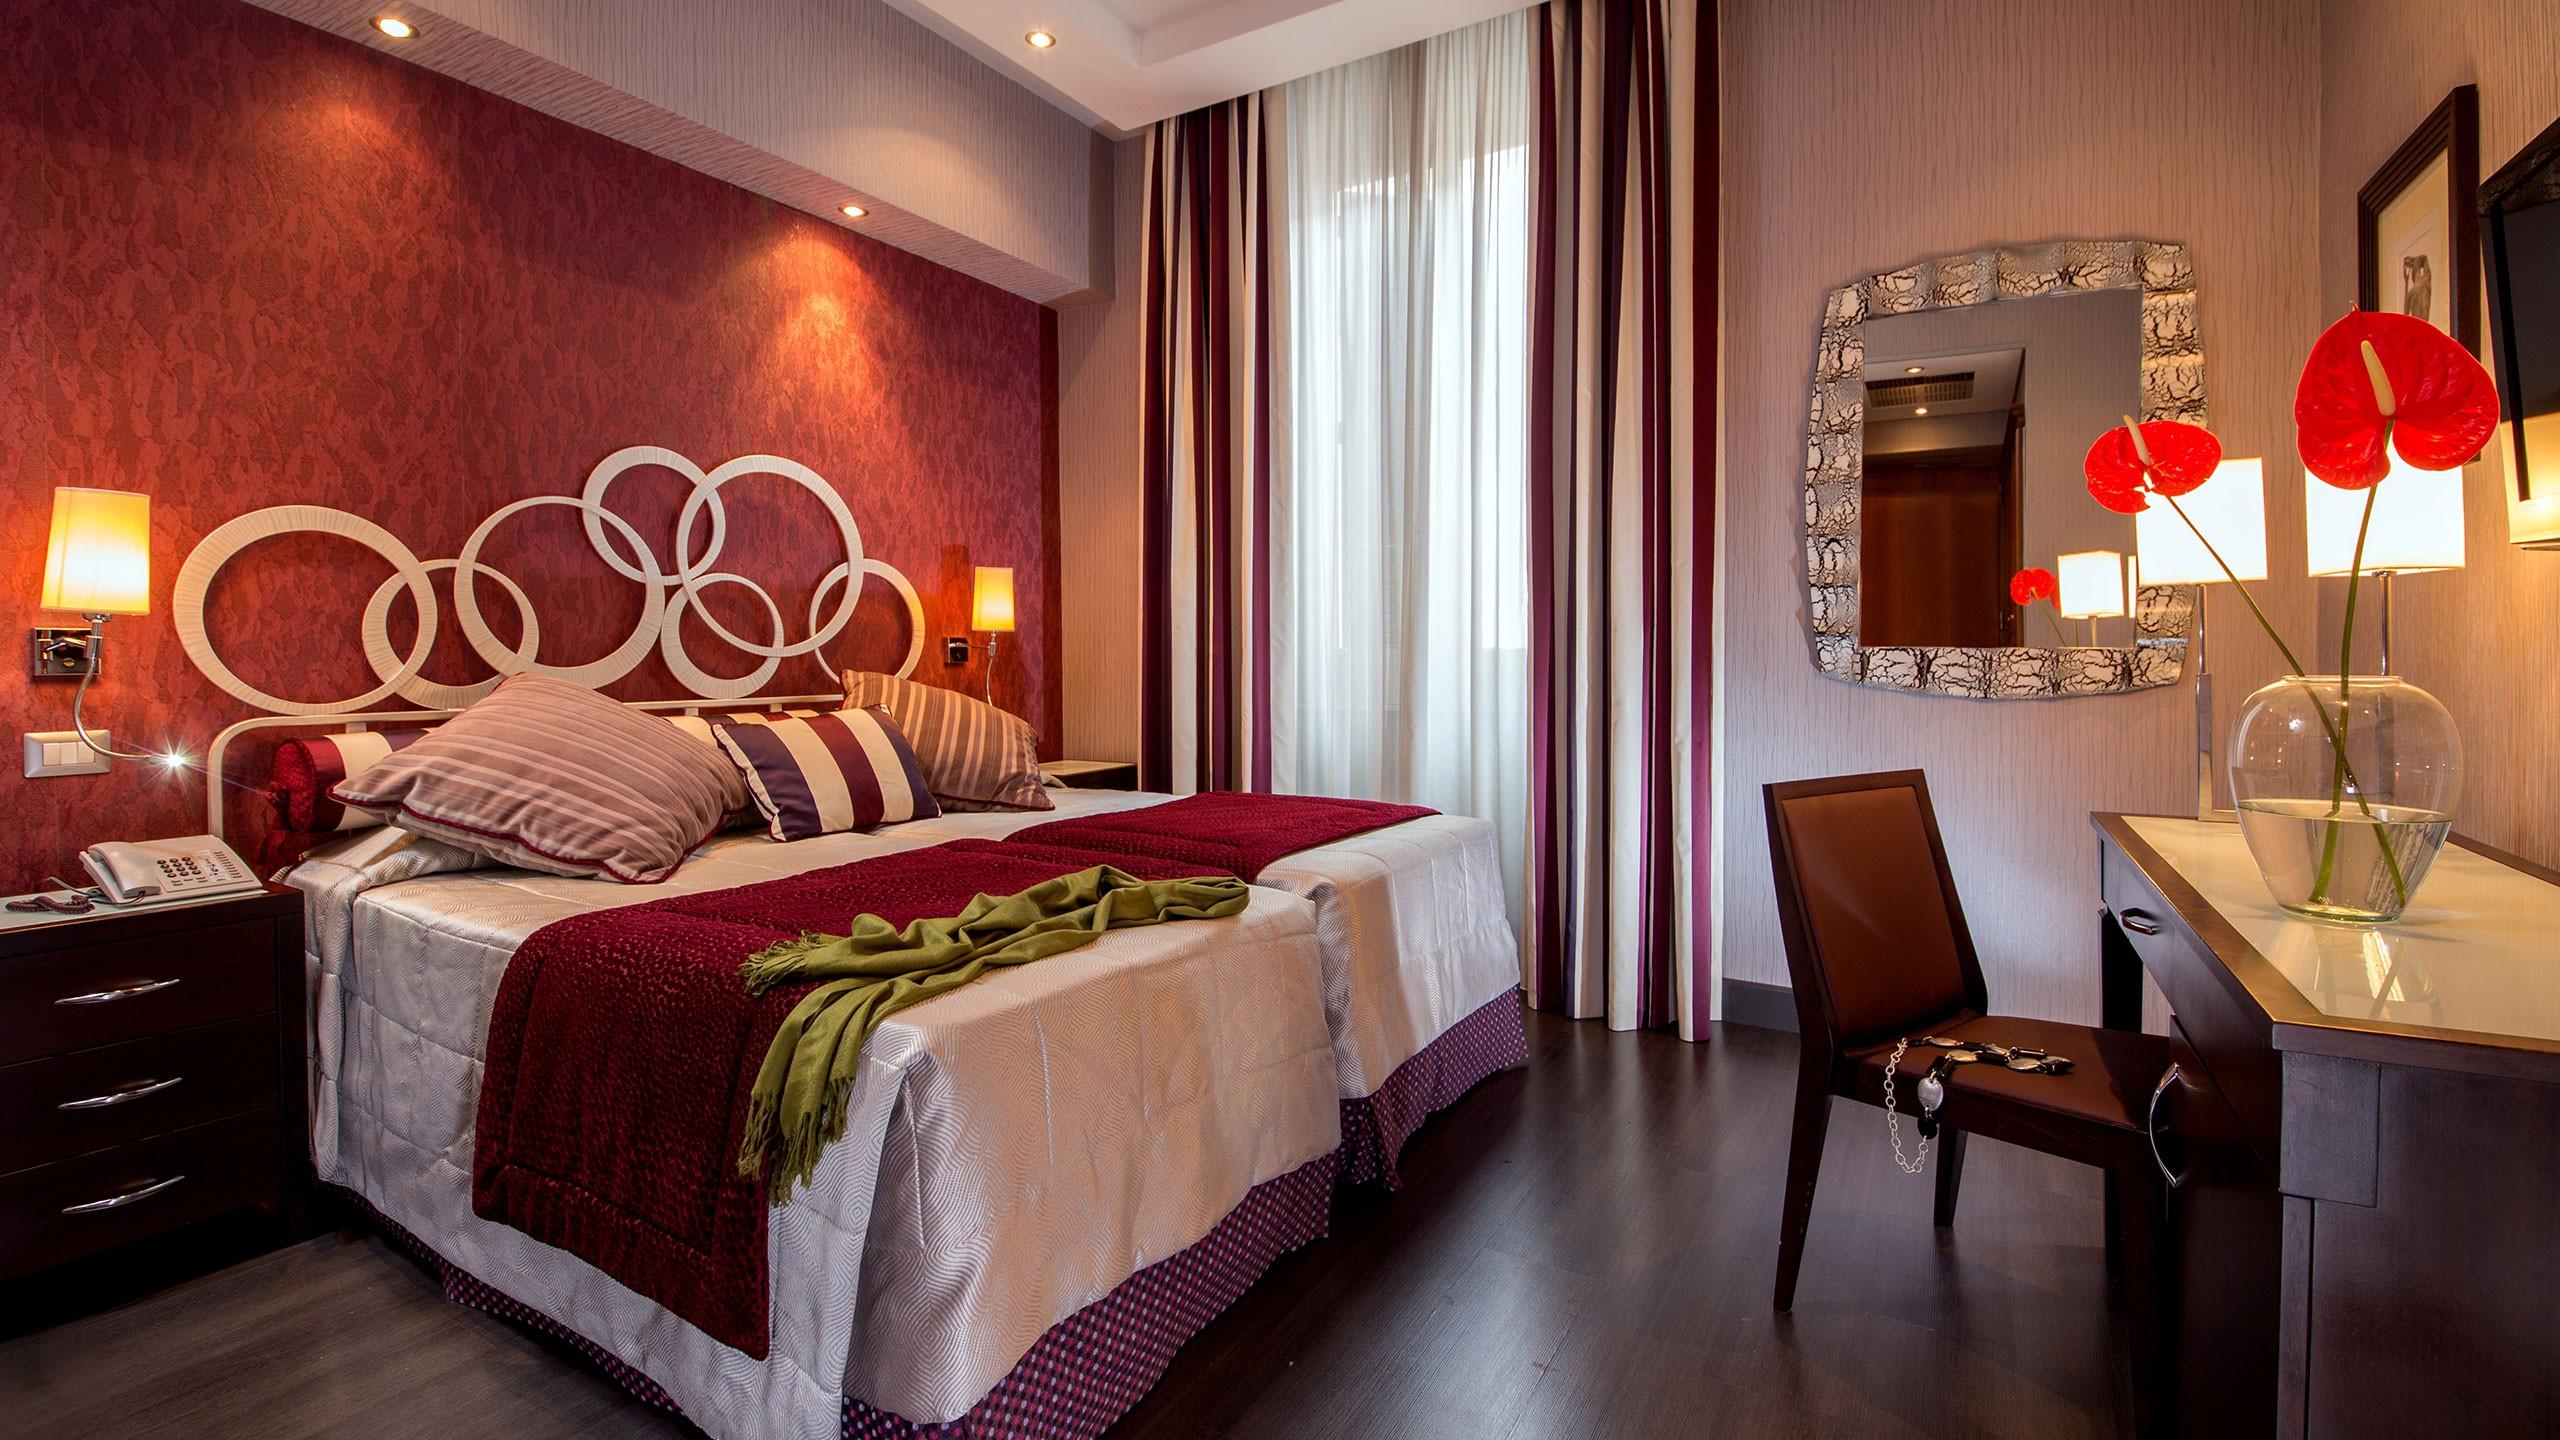 Hotel-Morgana-Rome-Executive-room-2